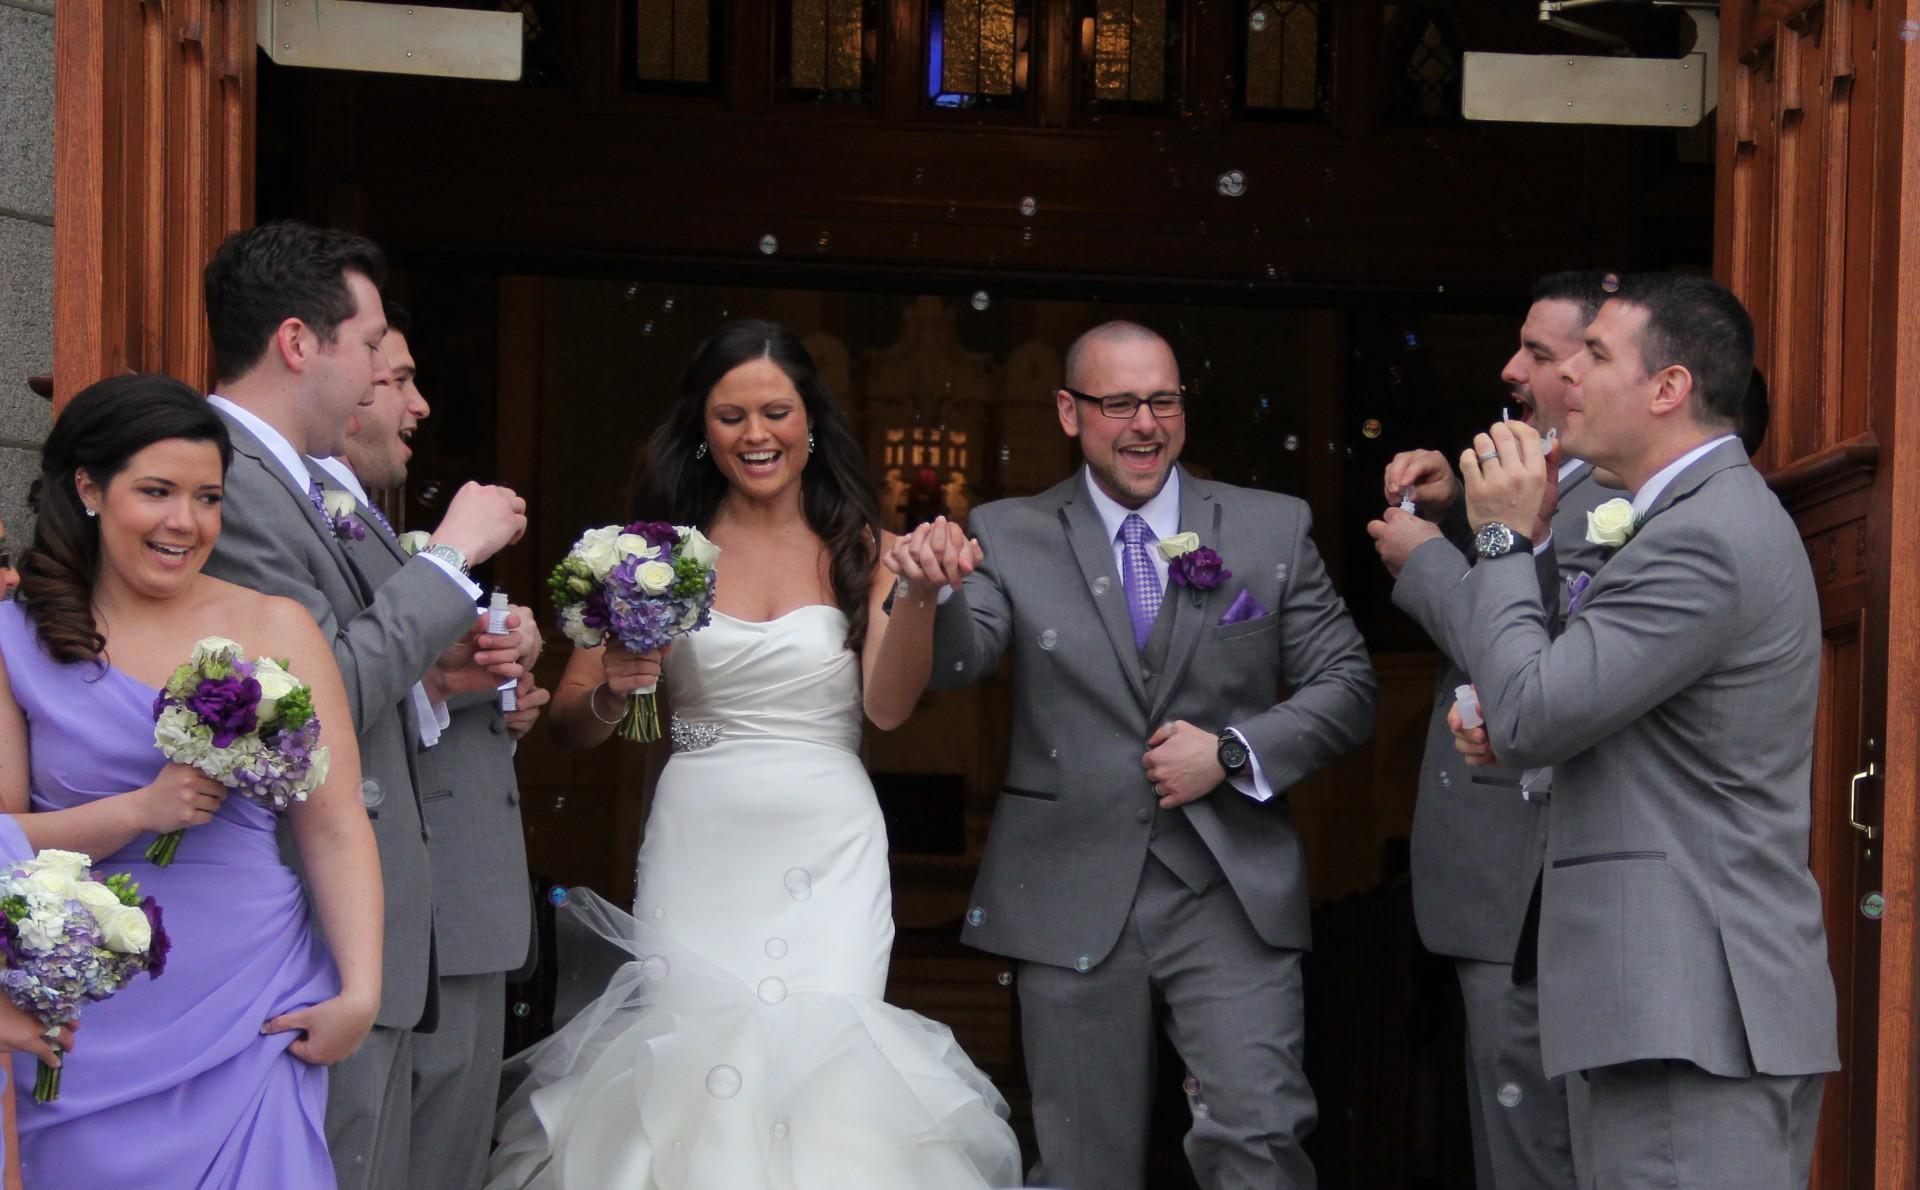 Wedding photographer in Syracuse, NY